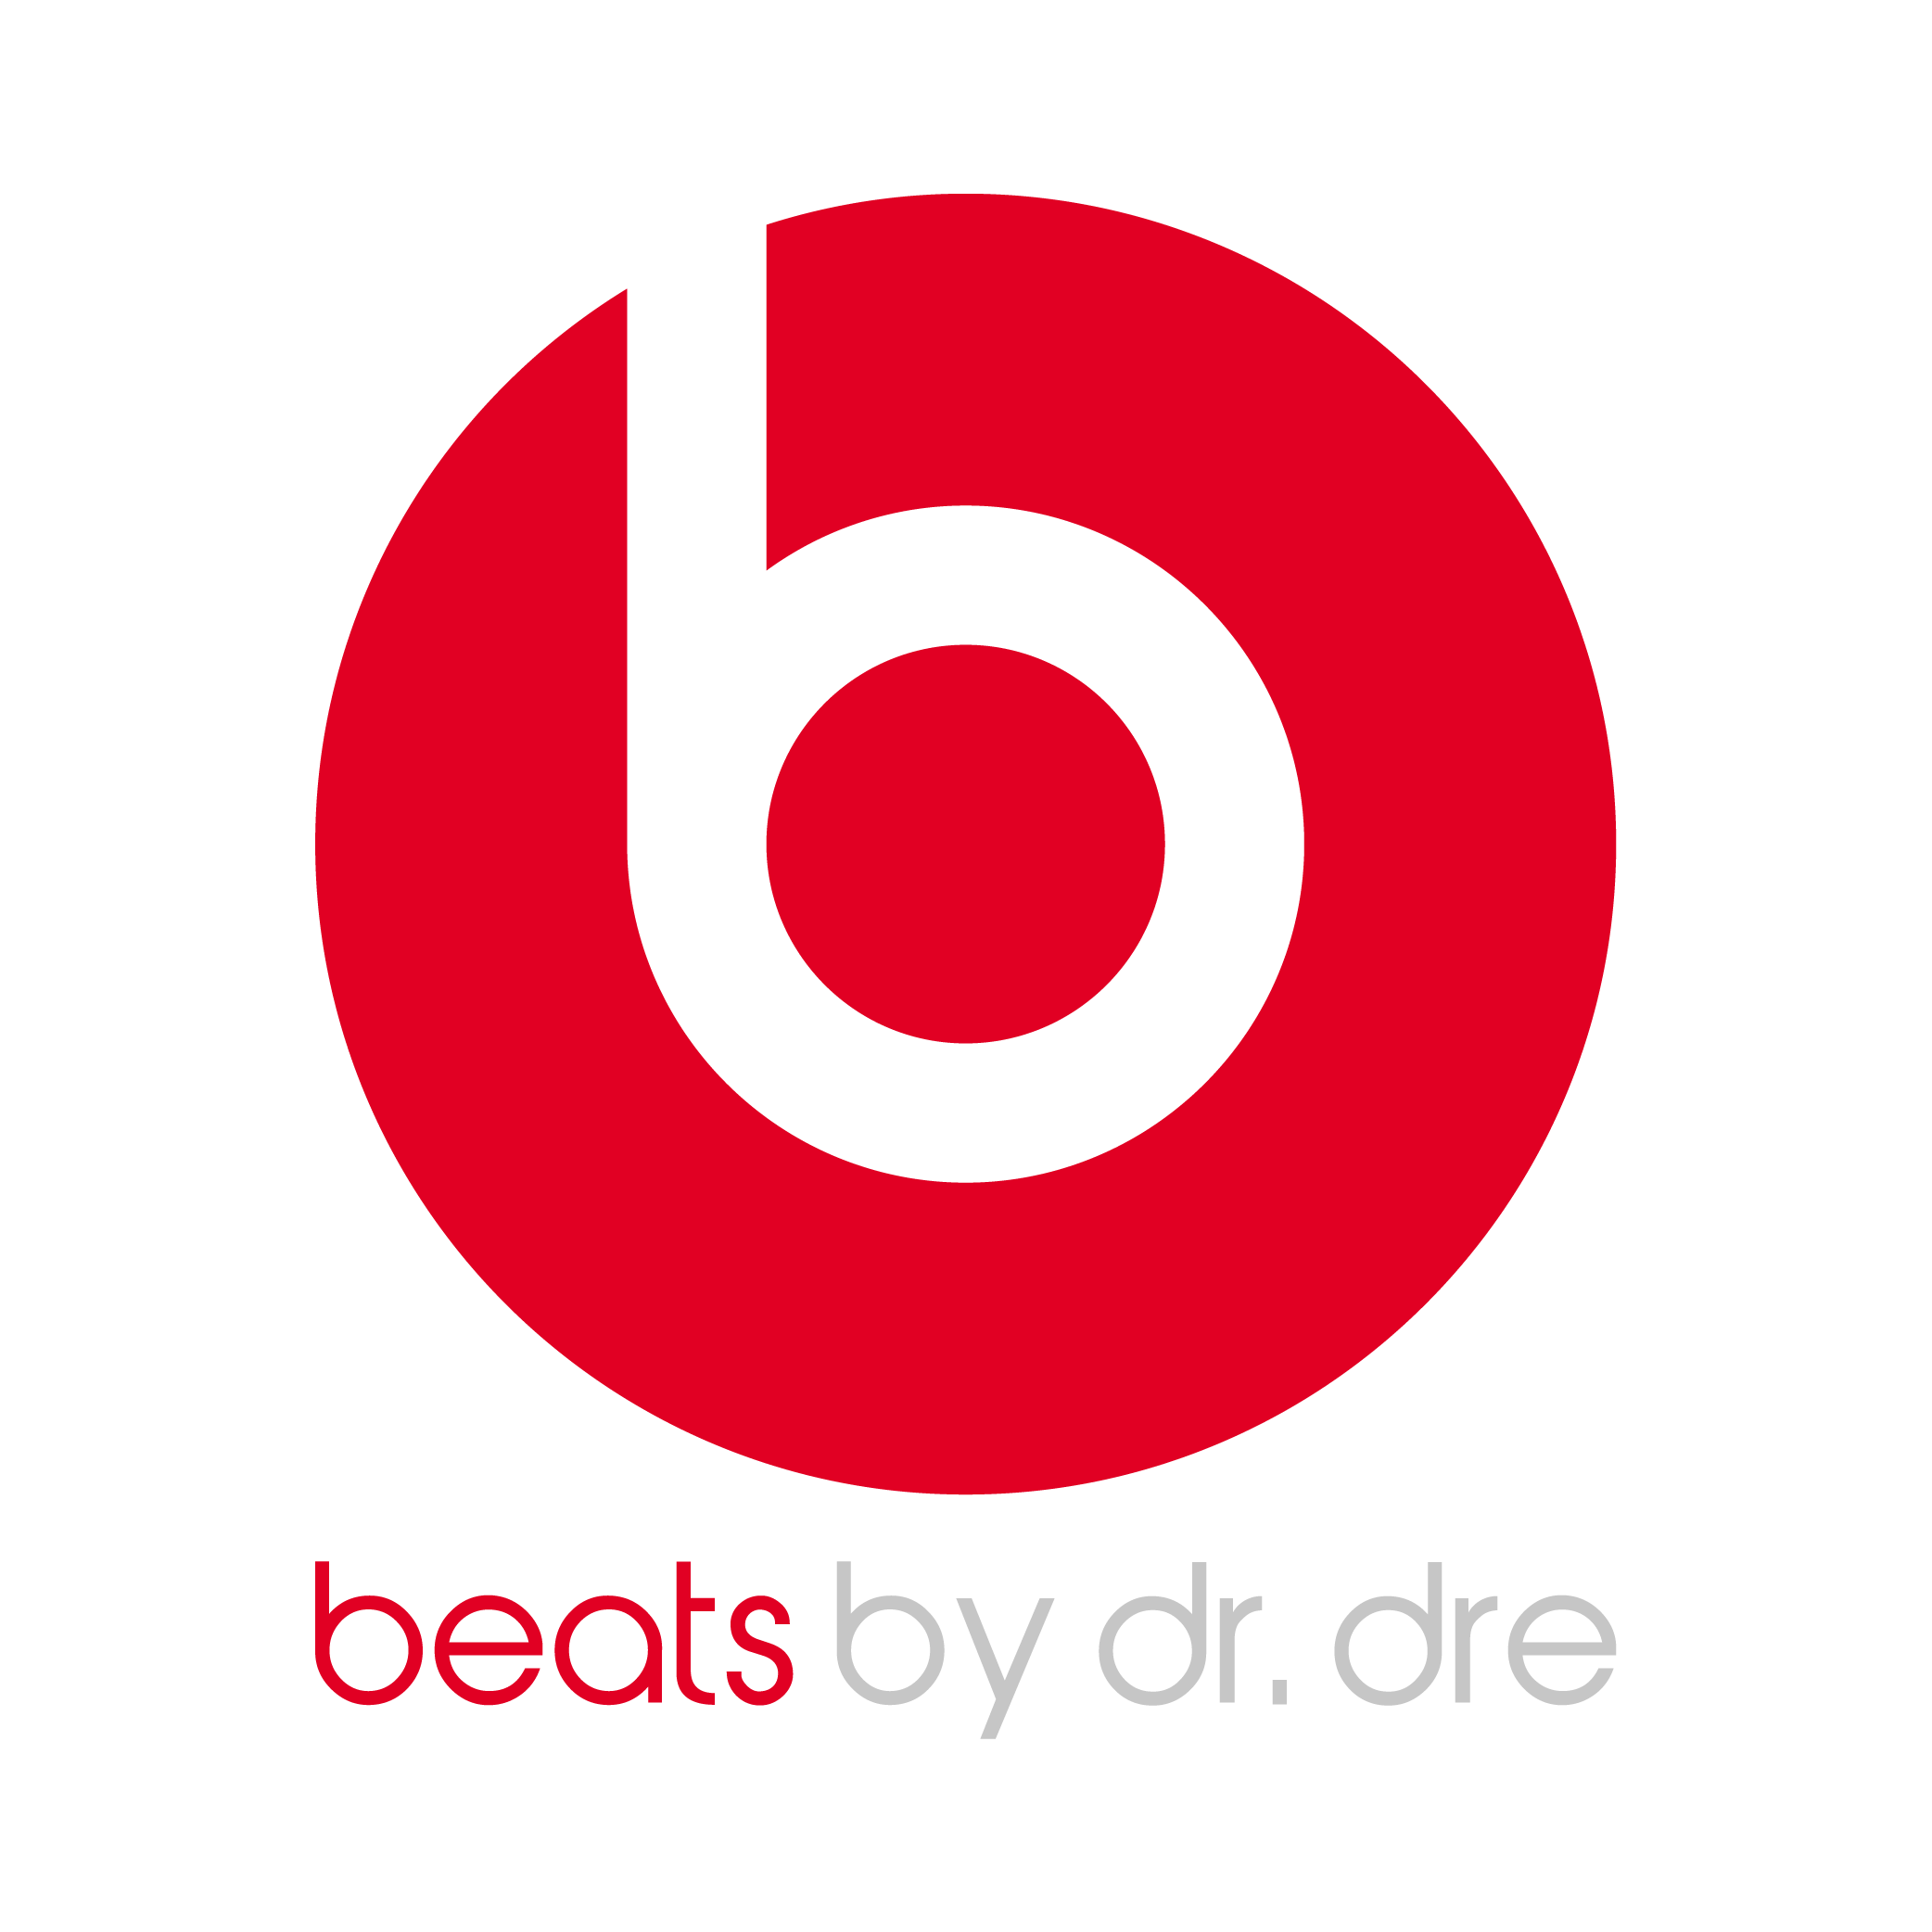 Logo Beats By Dr Dre Hdvector Illustrator Ai Azatdesign